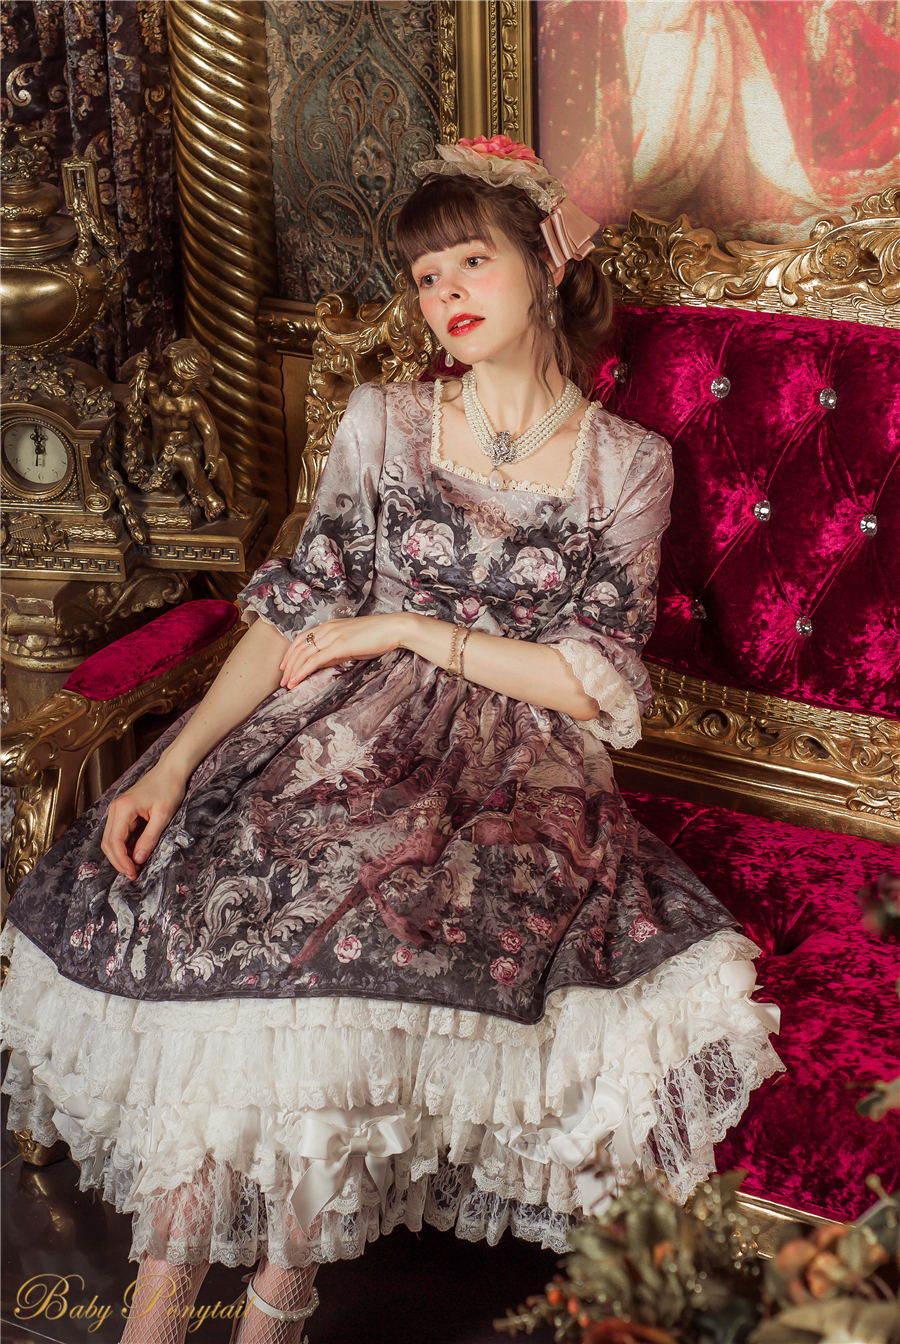 BabyPonytail_Rose Battle_Model Photo_OP Grey studio_Claudia_02.jpg